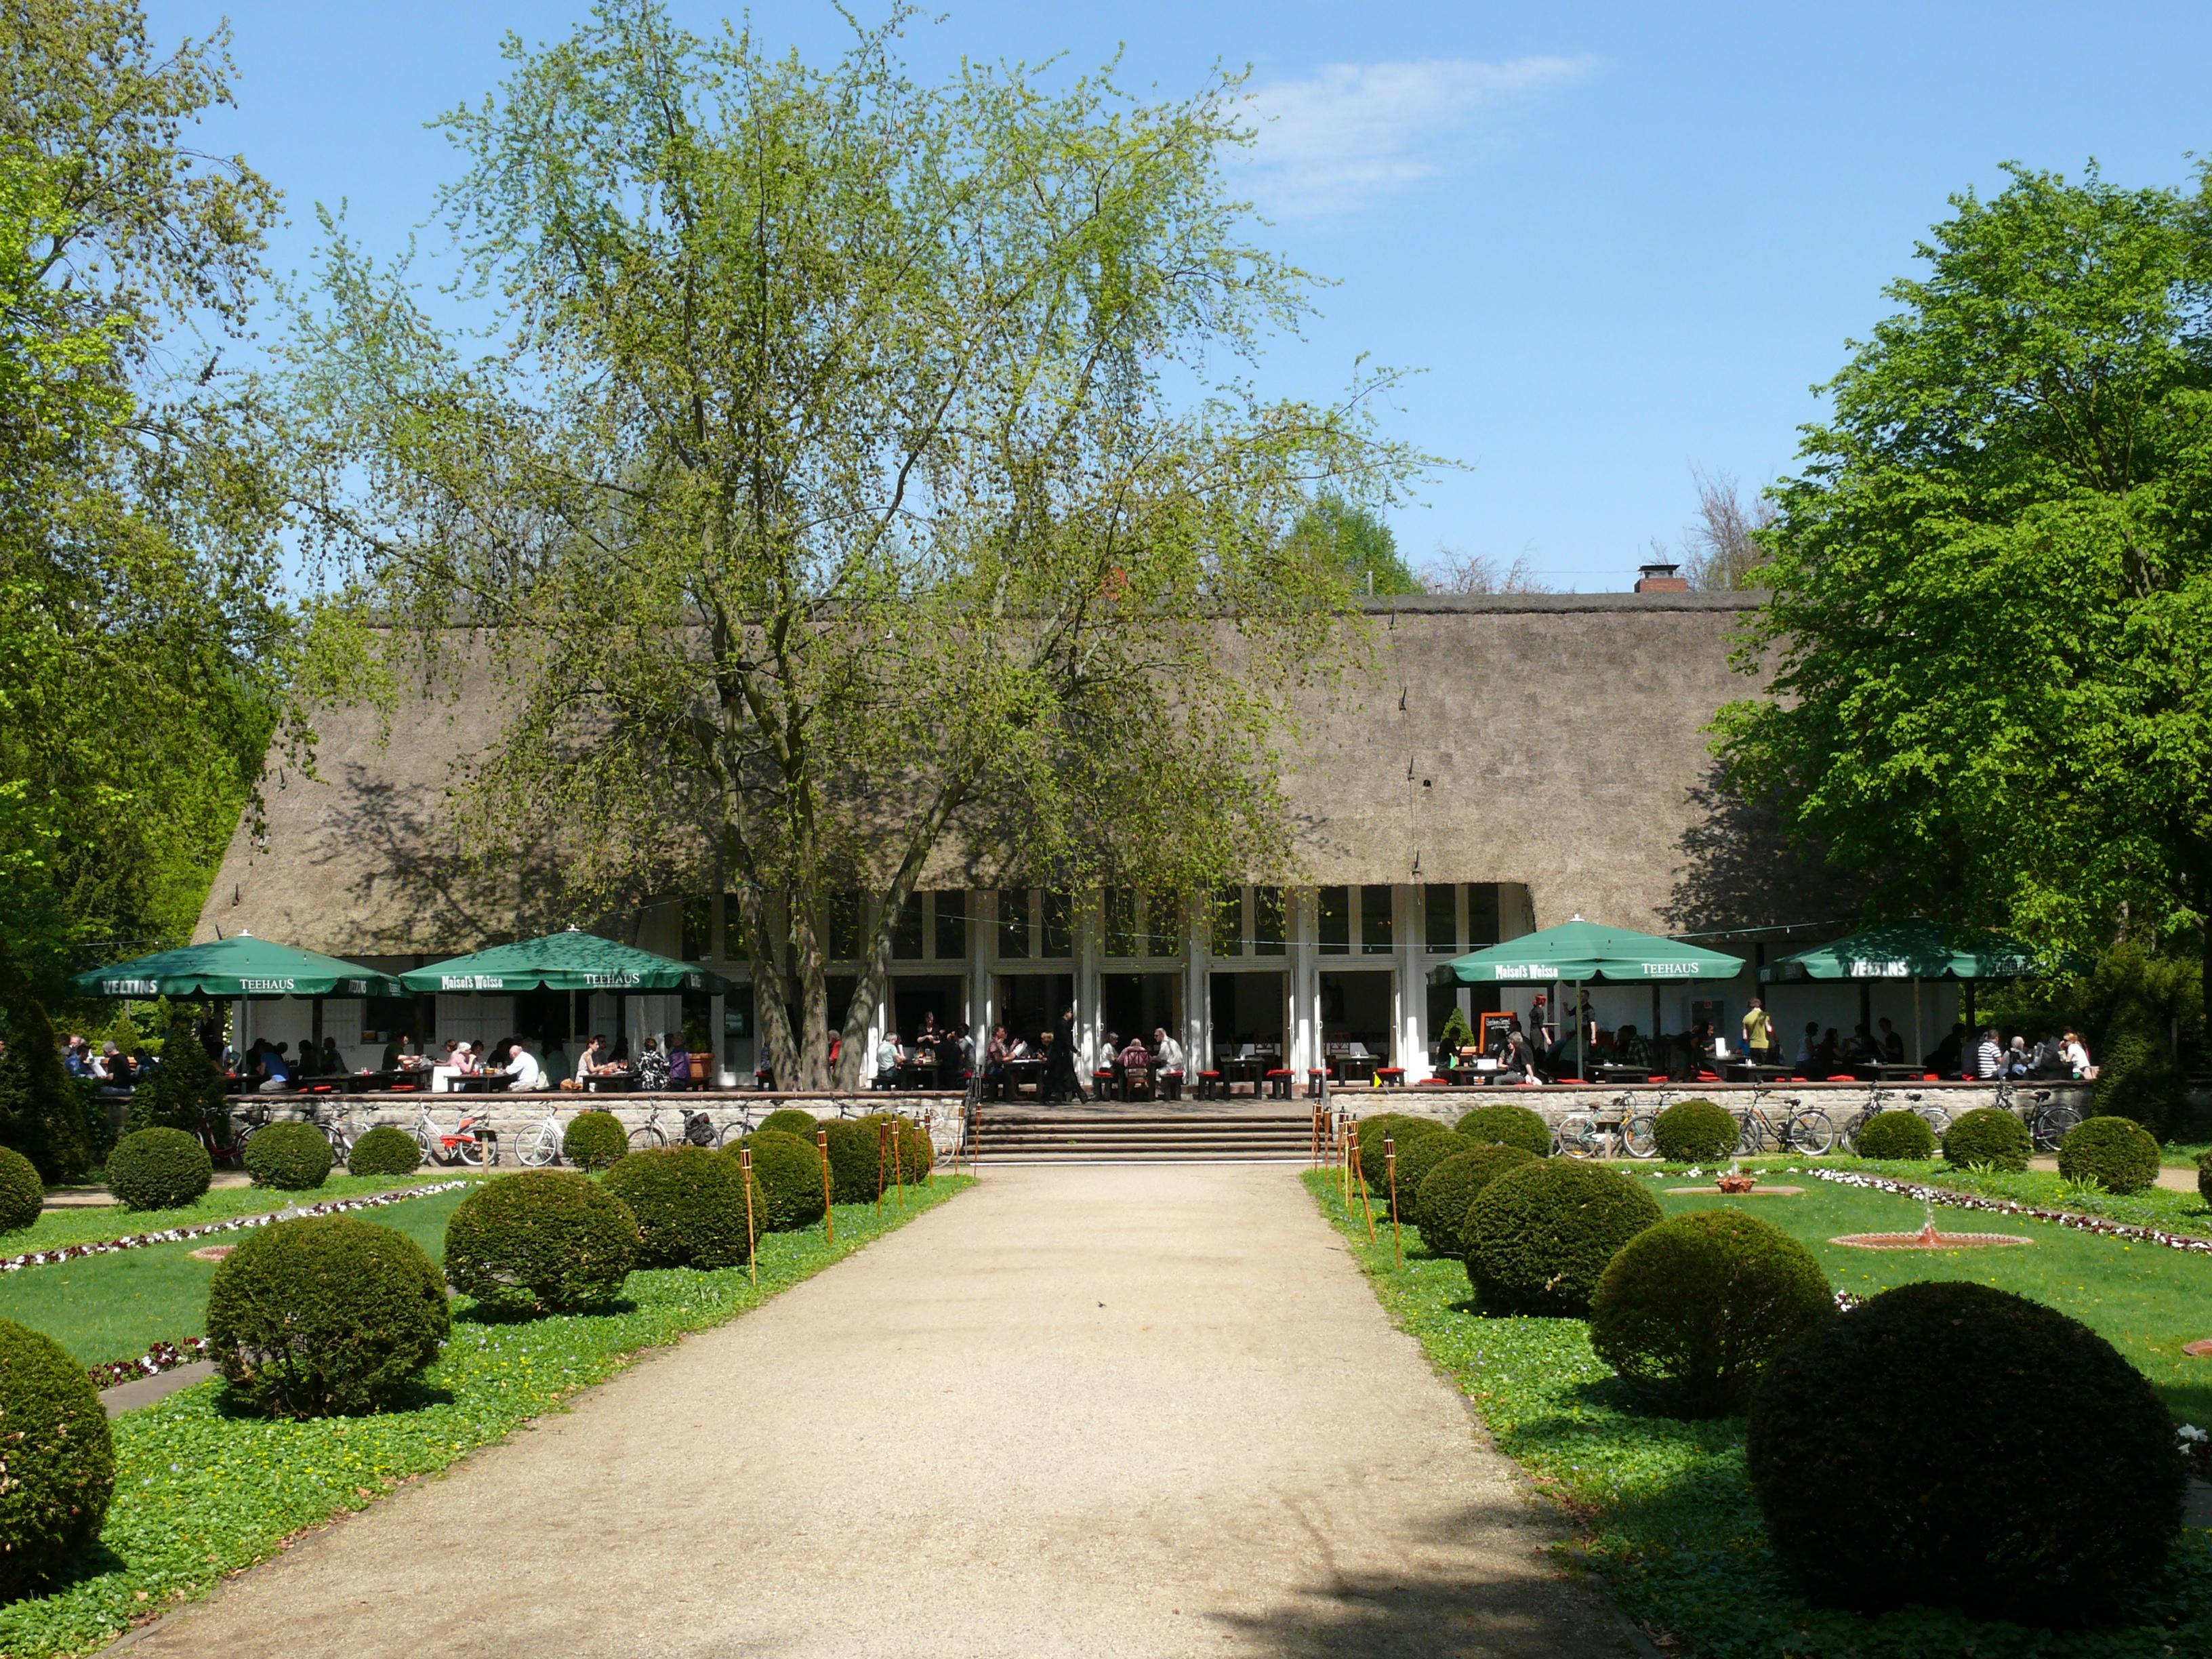 File Tiergarten Teehaus Im Englischen Garten JPG Wikimedia Commons